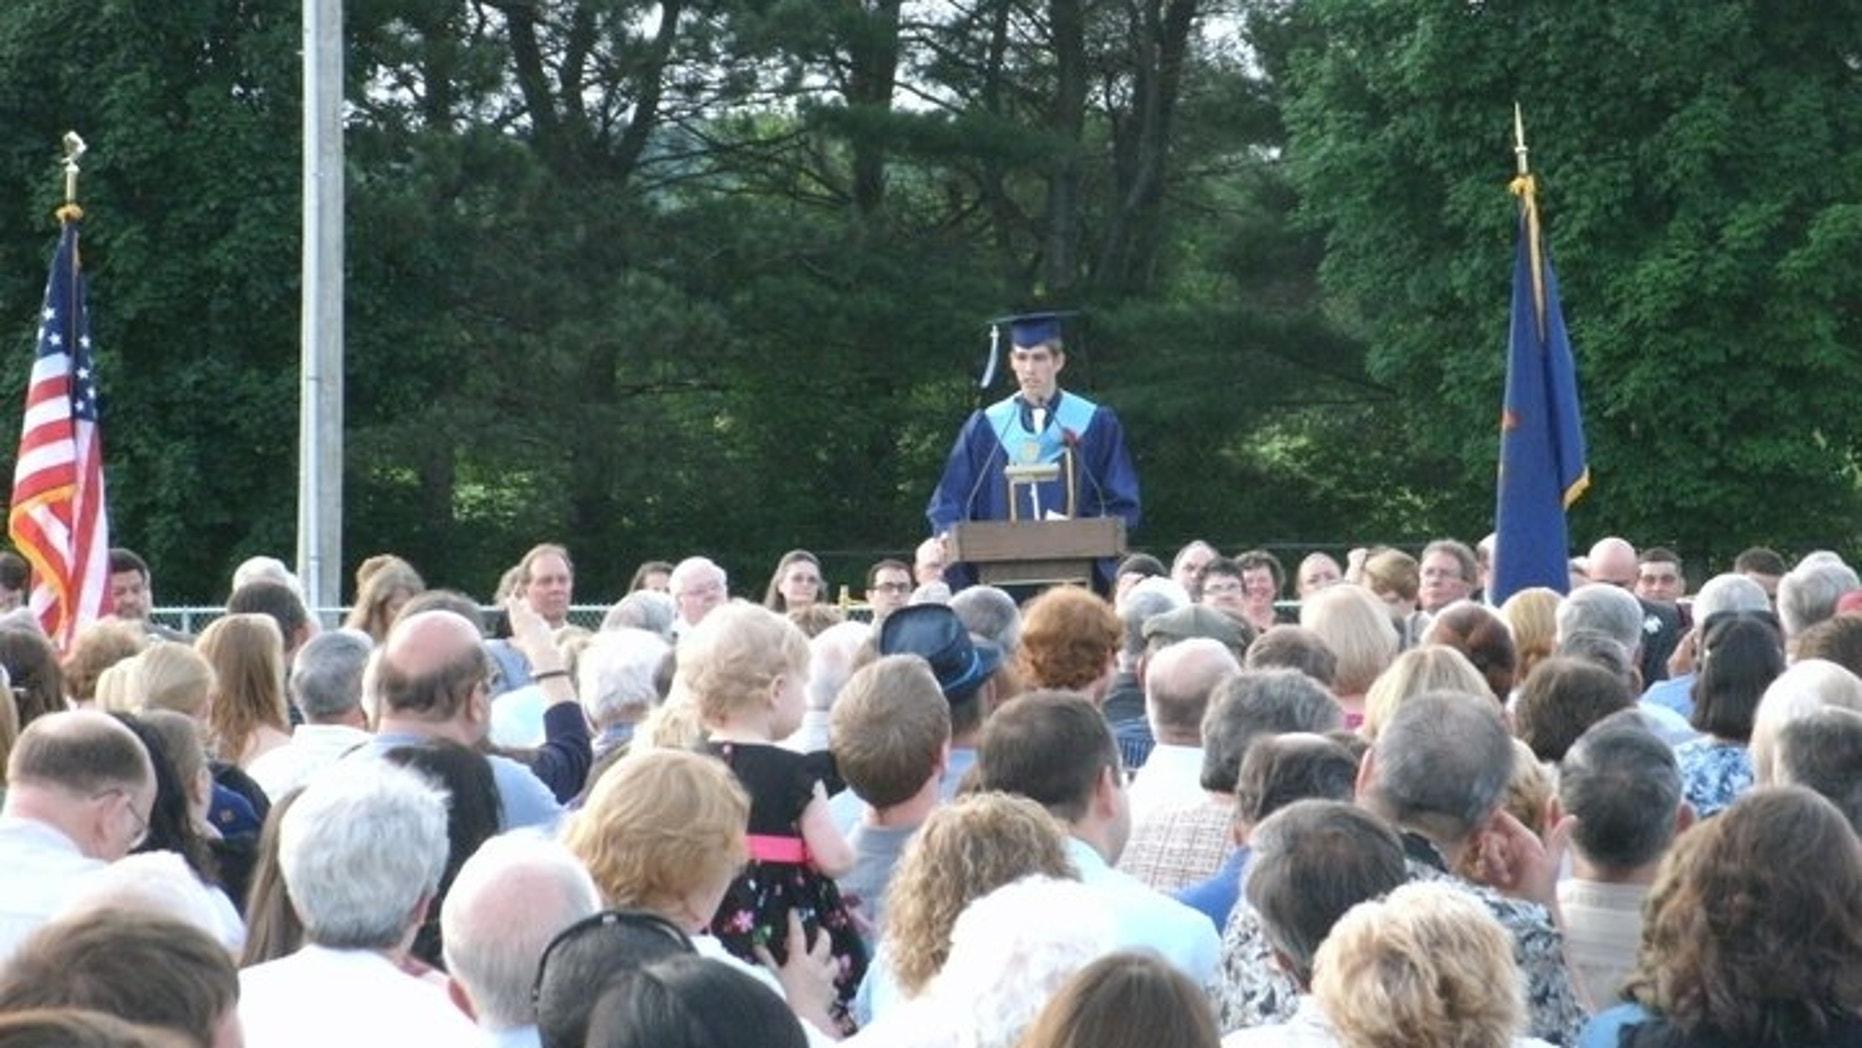 Vermont valedictorian Kyle Gearwar told to he could not speak about Jesus in his graduation speech.